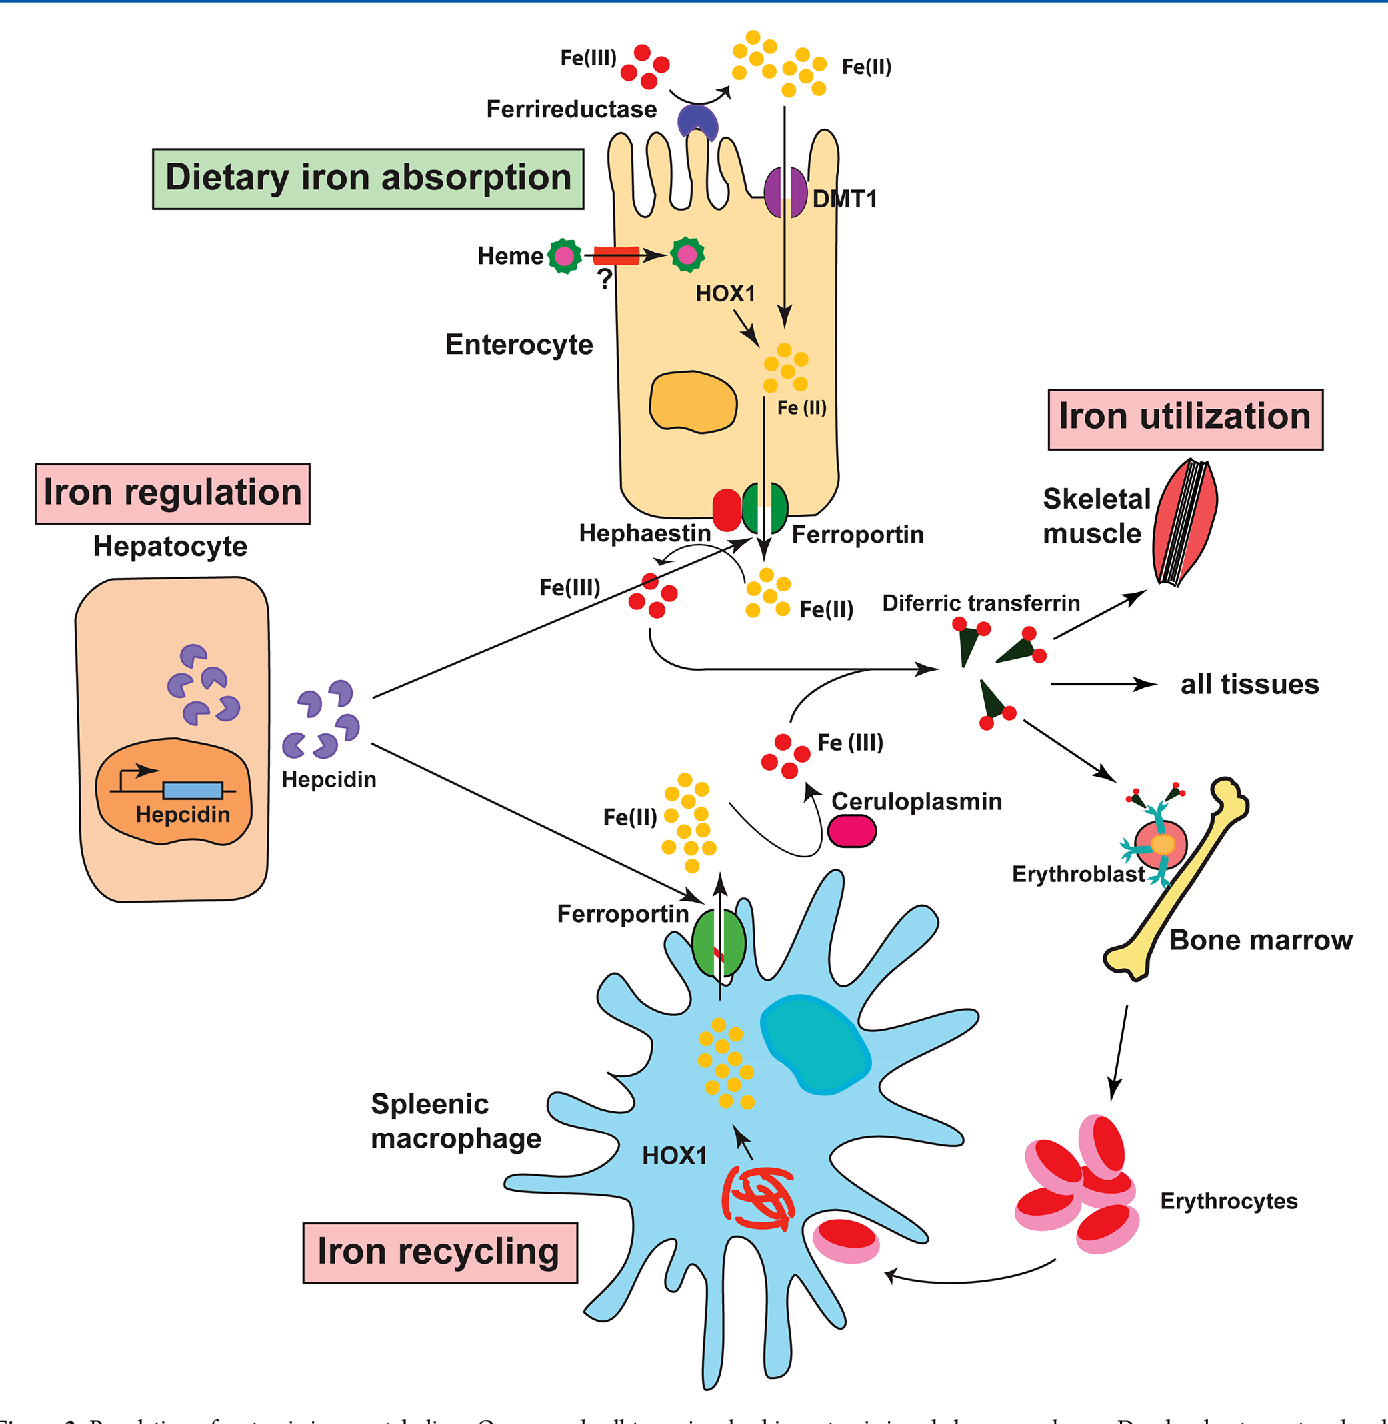 1 Cellular iron metabolism. Iron transport across the